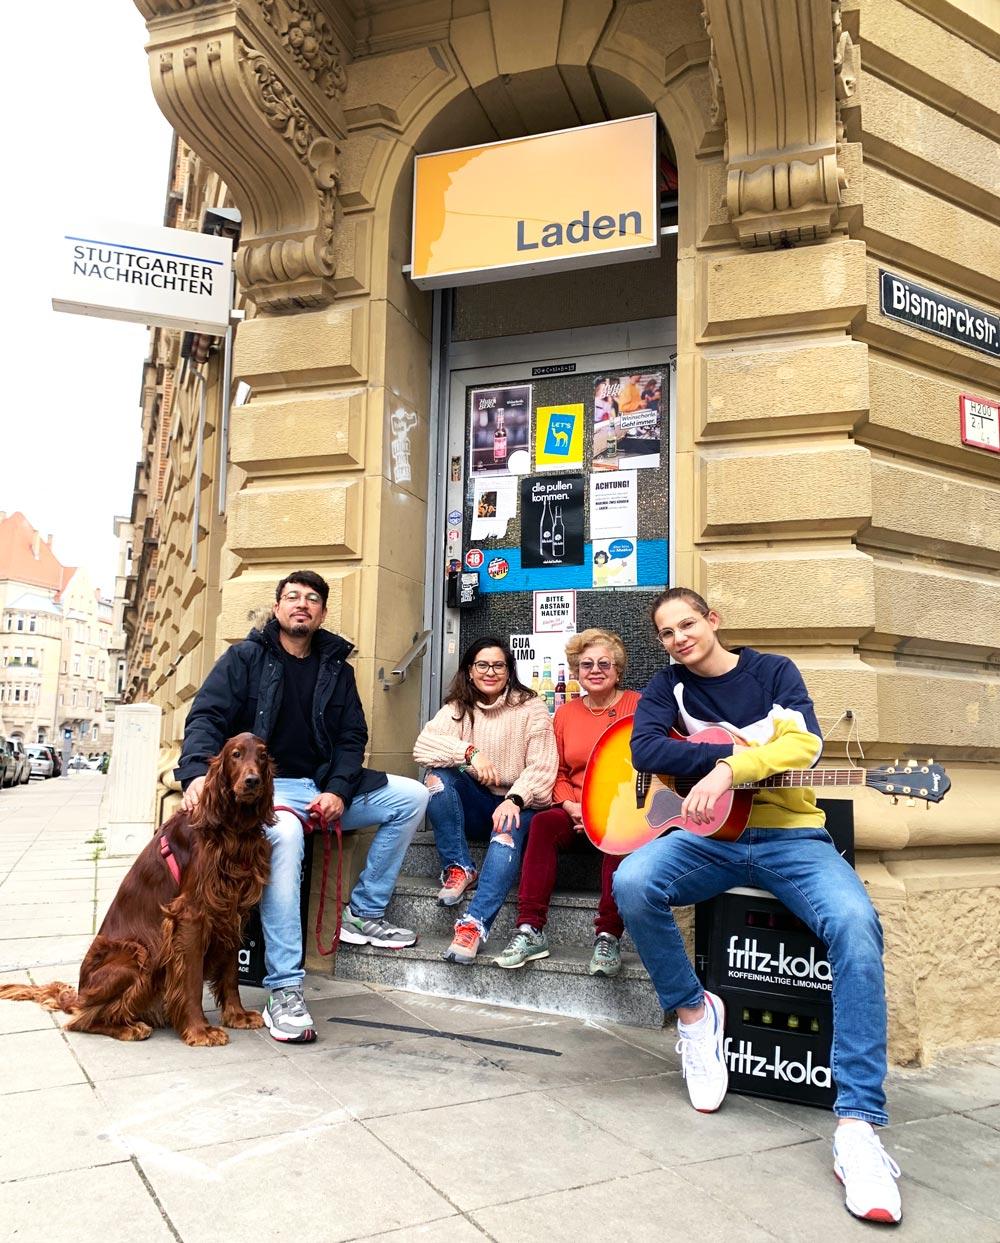 Laden 0711 Stuttgart West